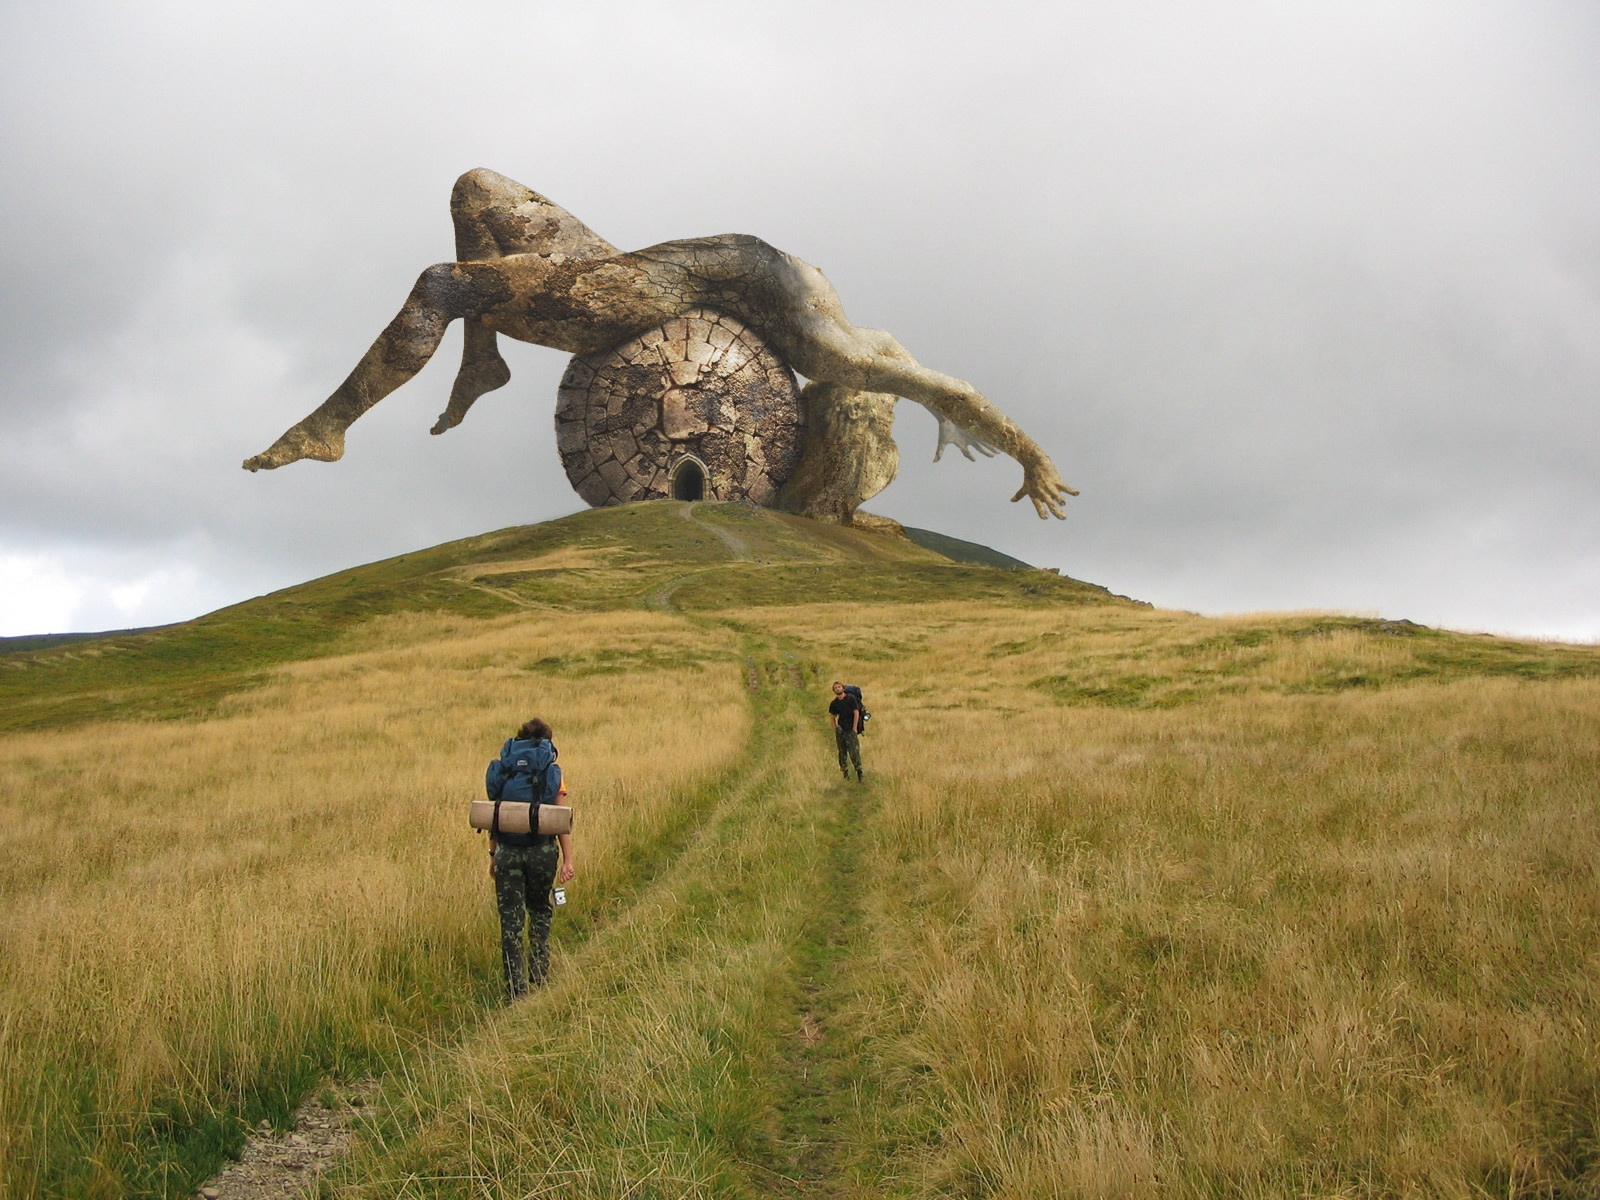 CGI - Cool  Fallen God Monument CGI Hill Wallpaper